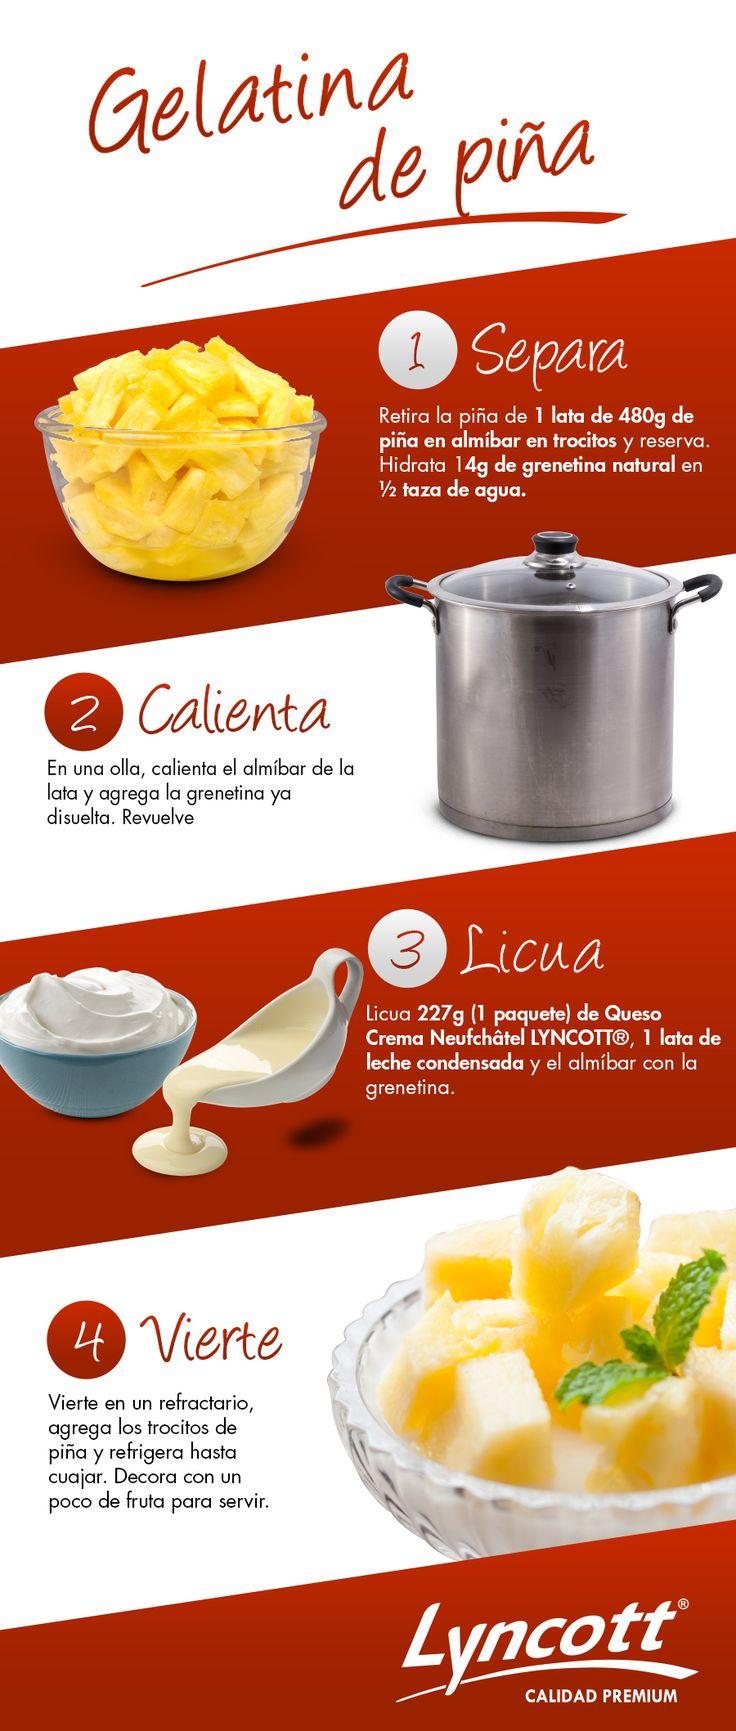 Gelatina de piña #Lyncott #RecetaFácil #Piña #Saludable #LecheCondensada #Queso #Postre #Gelatina